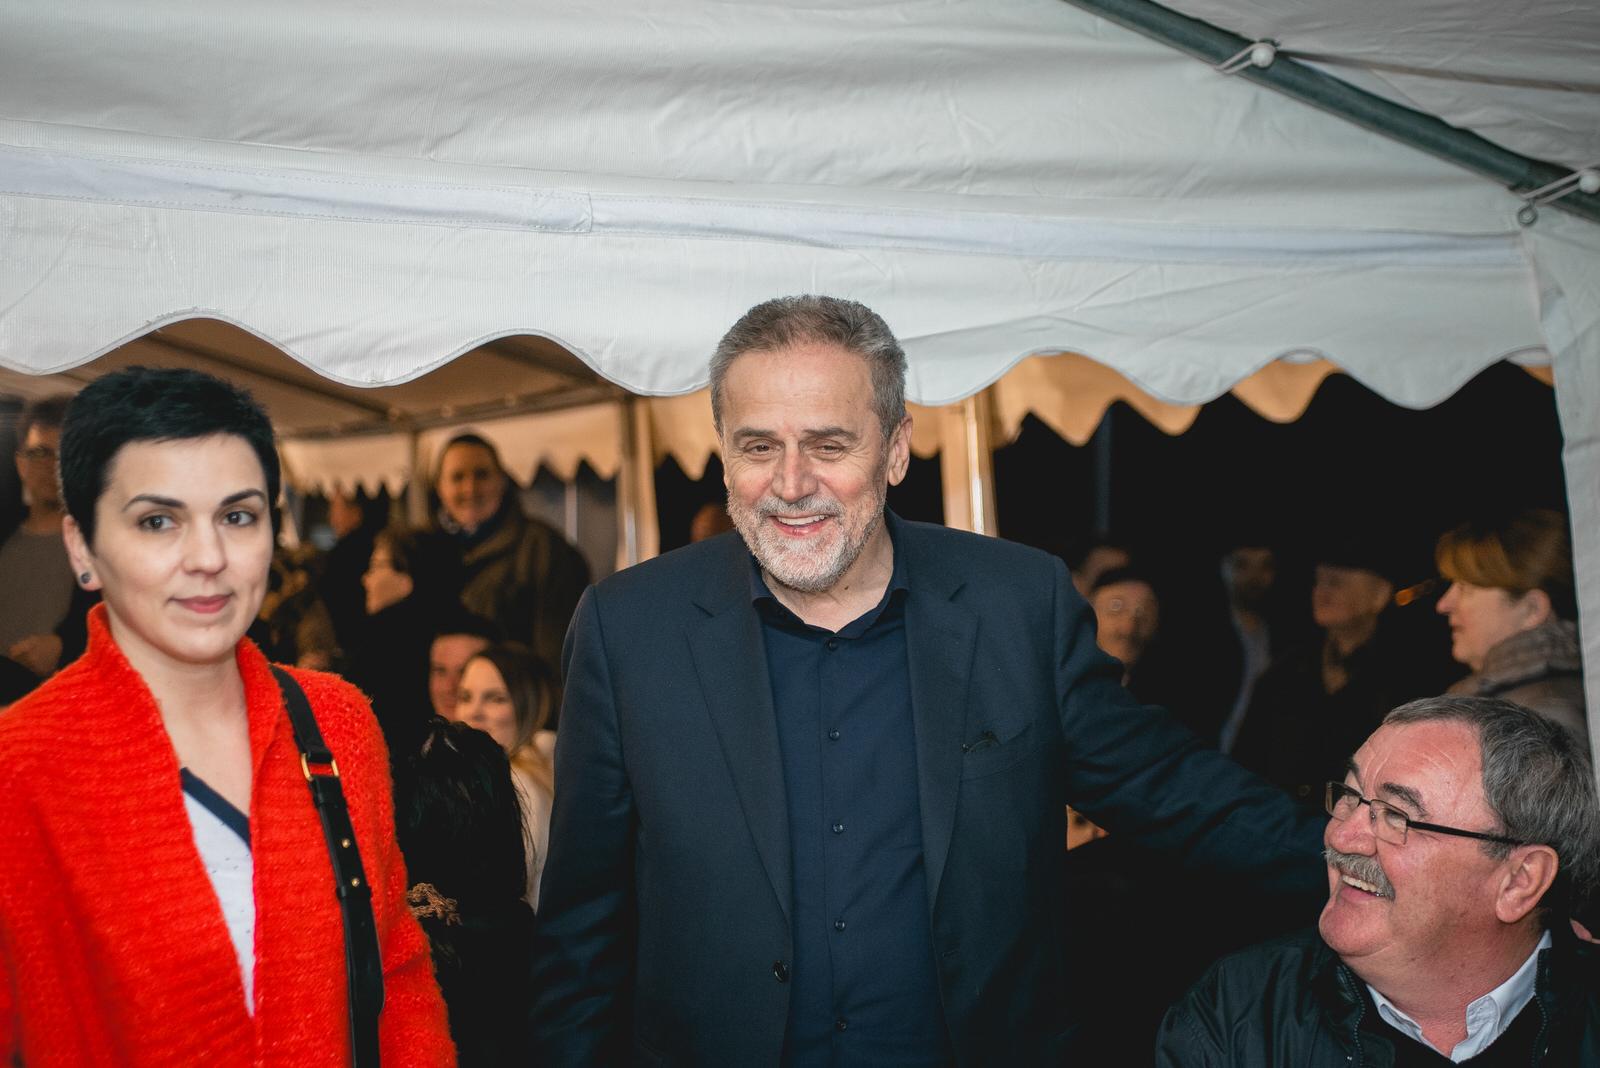 likaclub_milan-bandić-lički-osik_2019-19